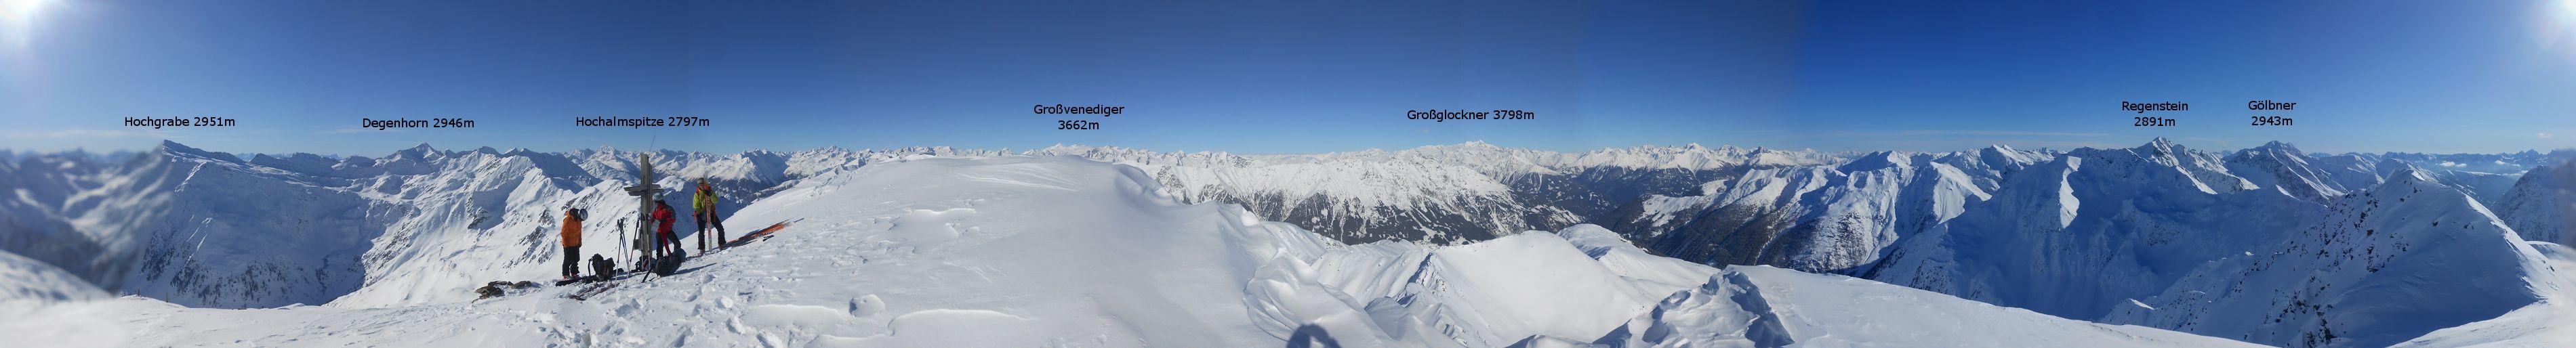 Panorama_Hochalmspitze